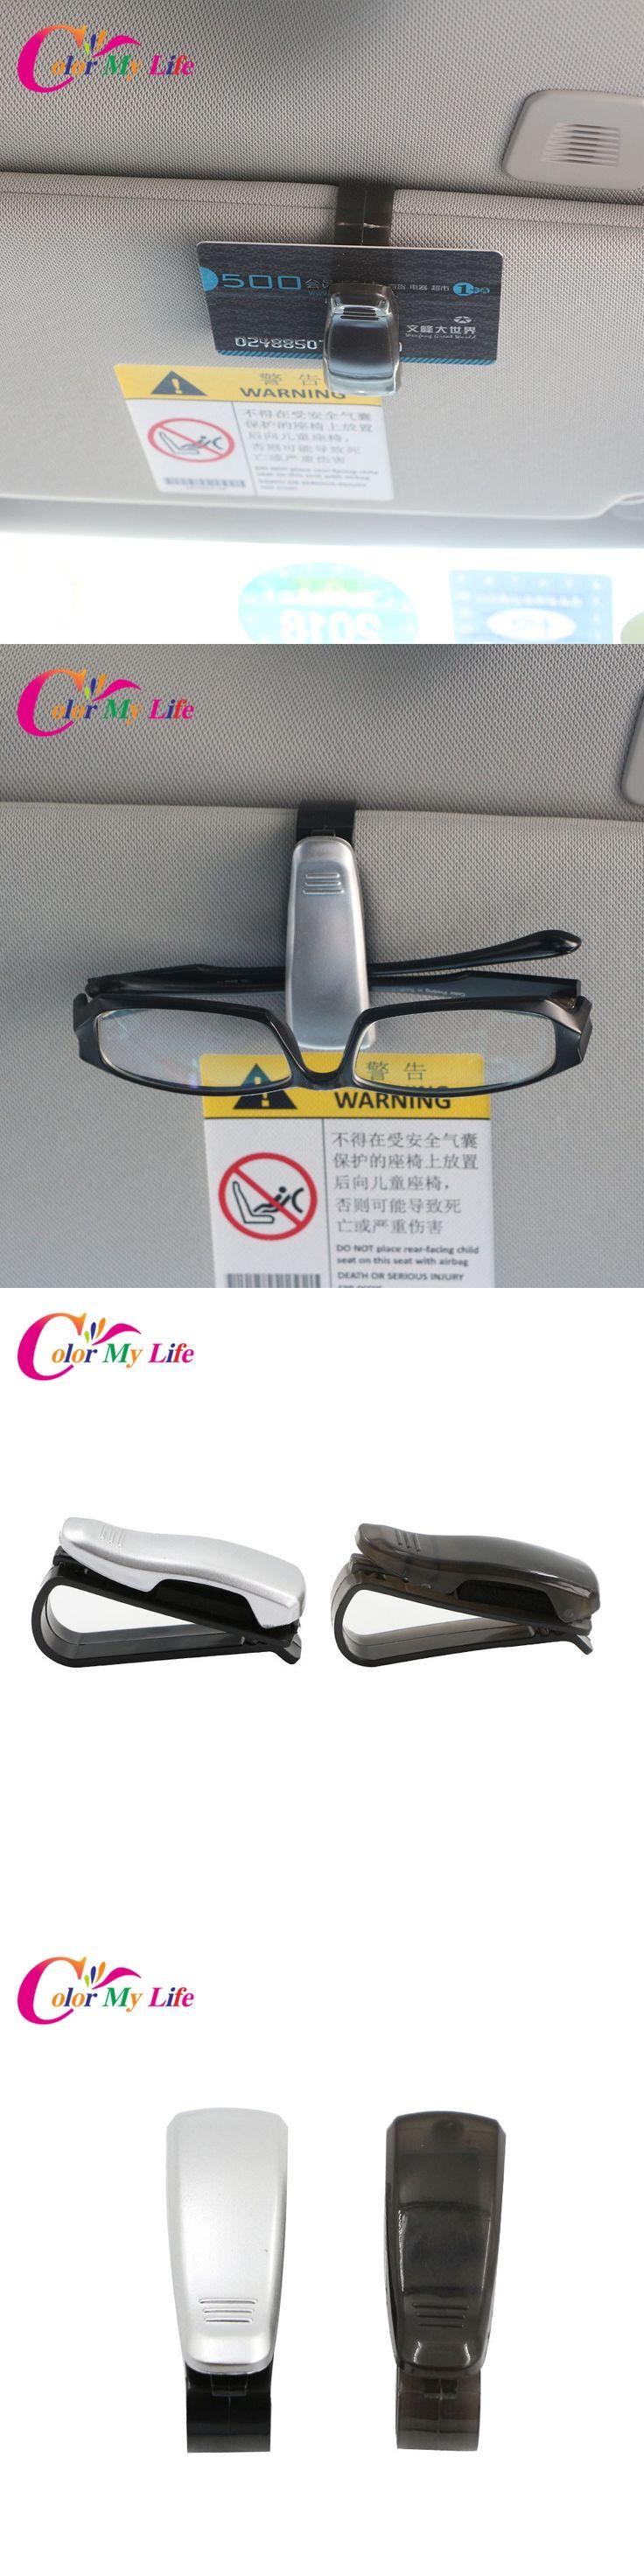 Car Glasses Holder Bank Card Ticket Holder Clip for Hyundai Solaris i20 ix25 i30 ix35 for Chevrolet Captiva Sail Orlando Lacetti